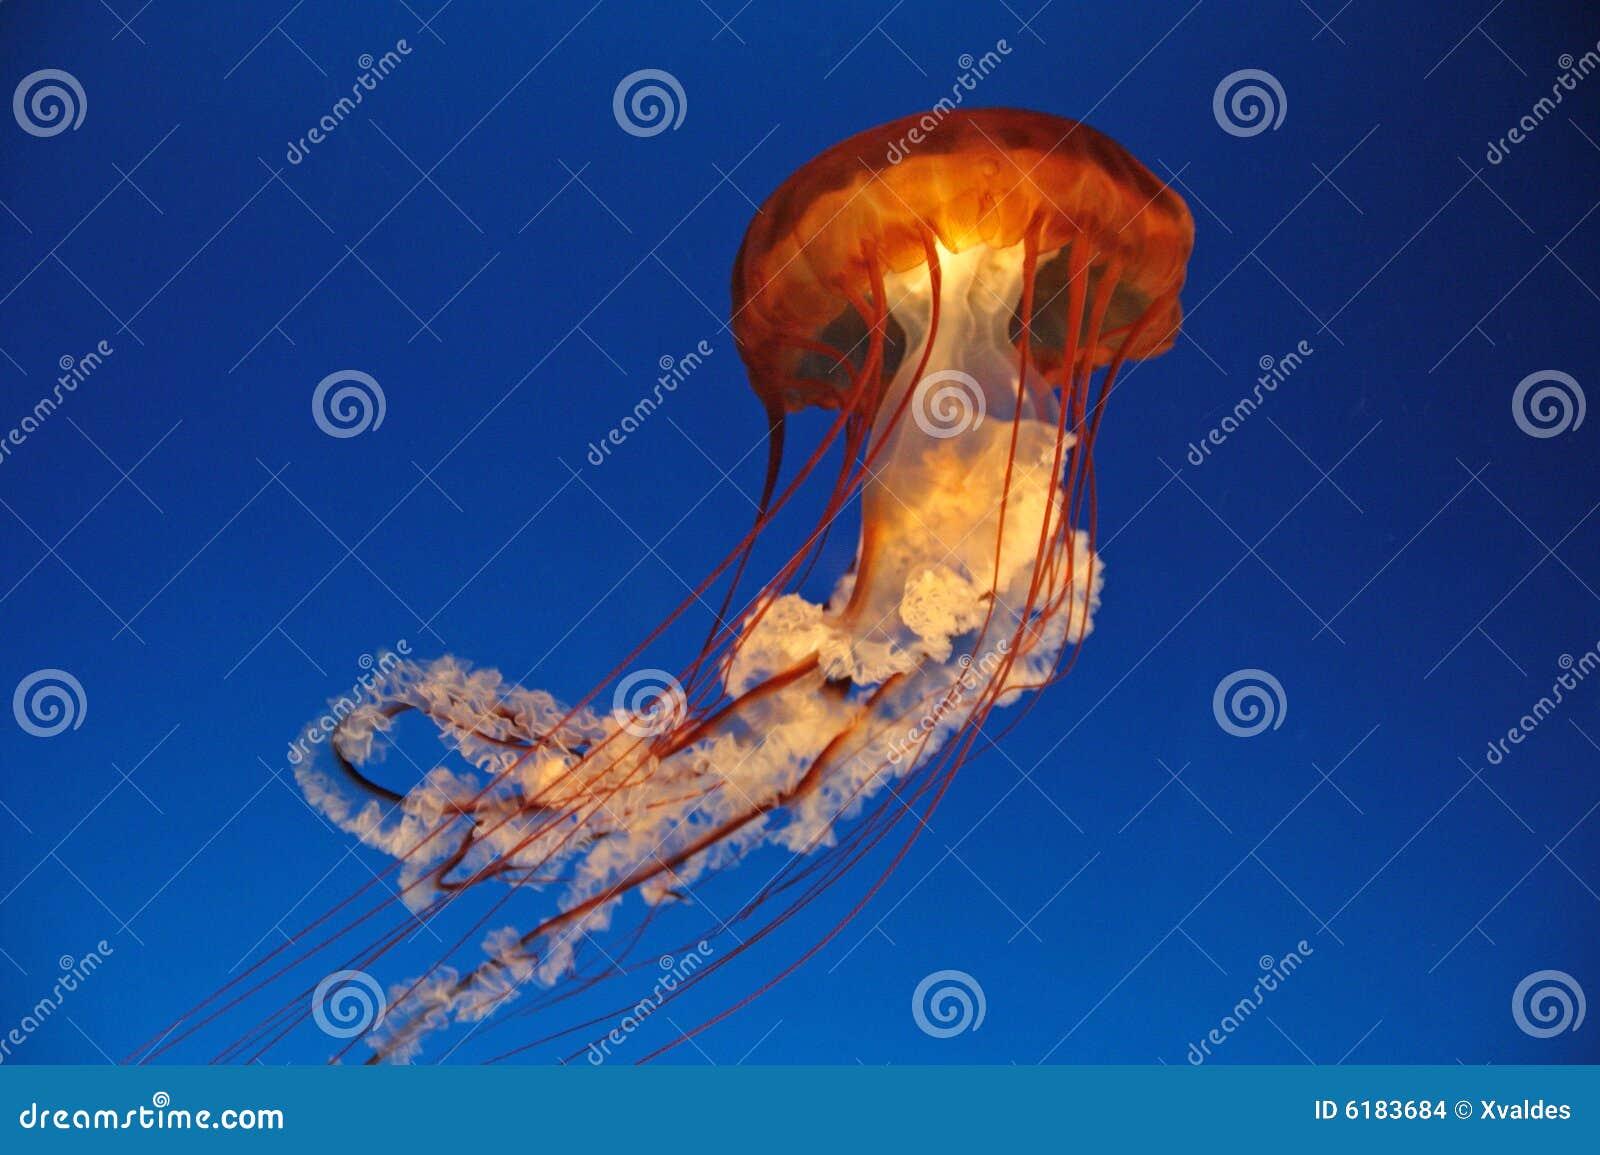 Meduza.